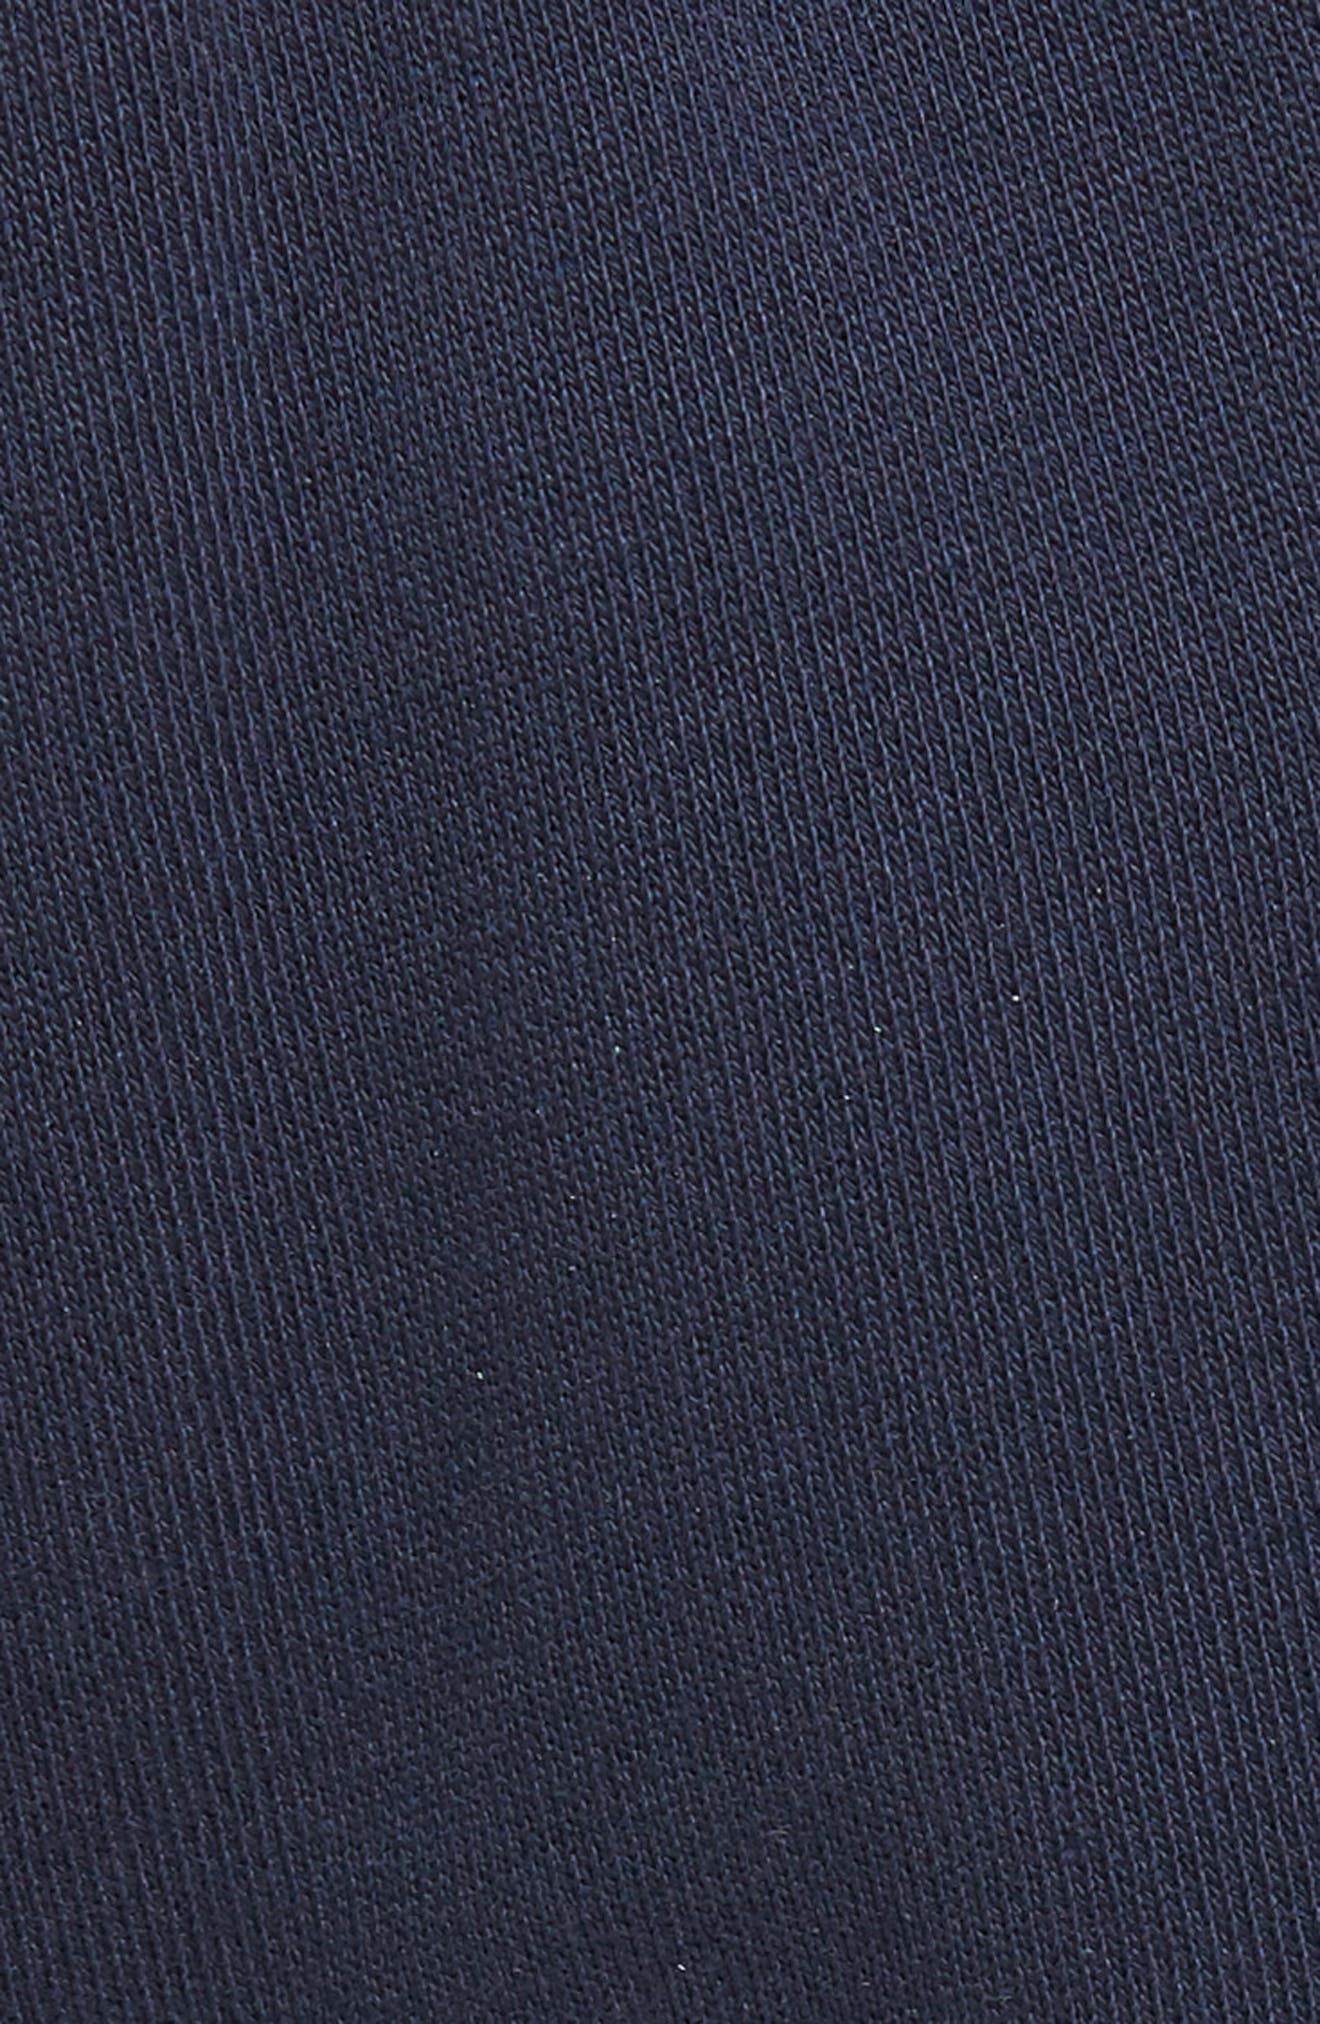 Lamont Snap Tab Sweatpants,                             Alternate thumbnail 5, color,                             410